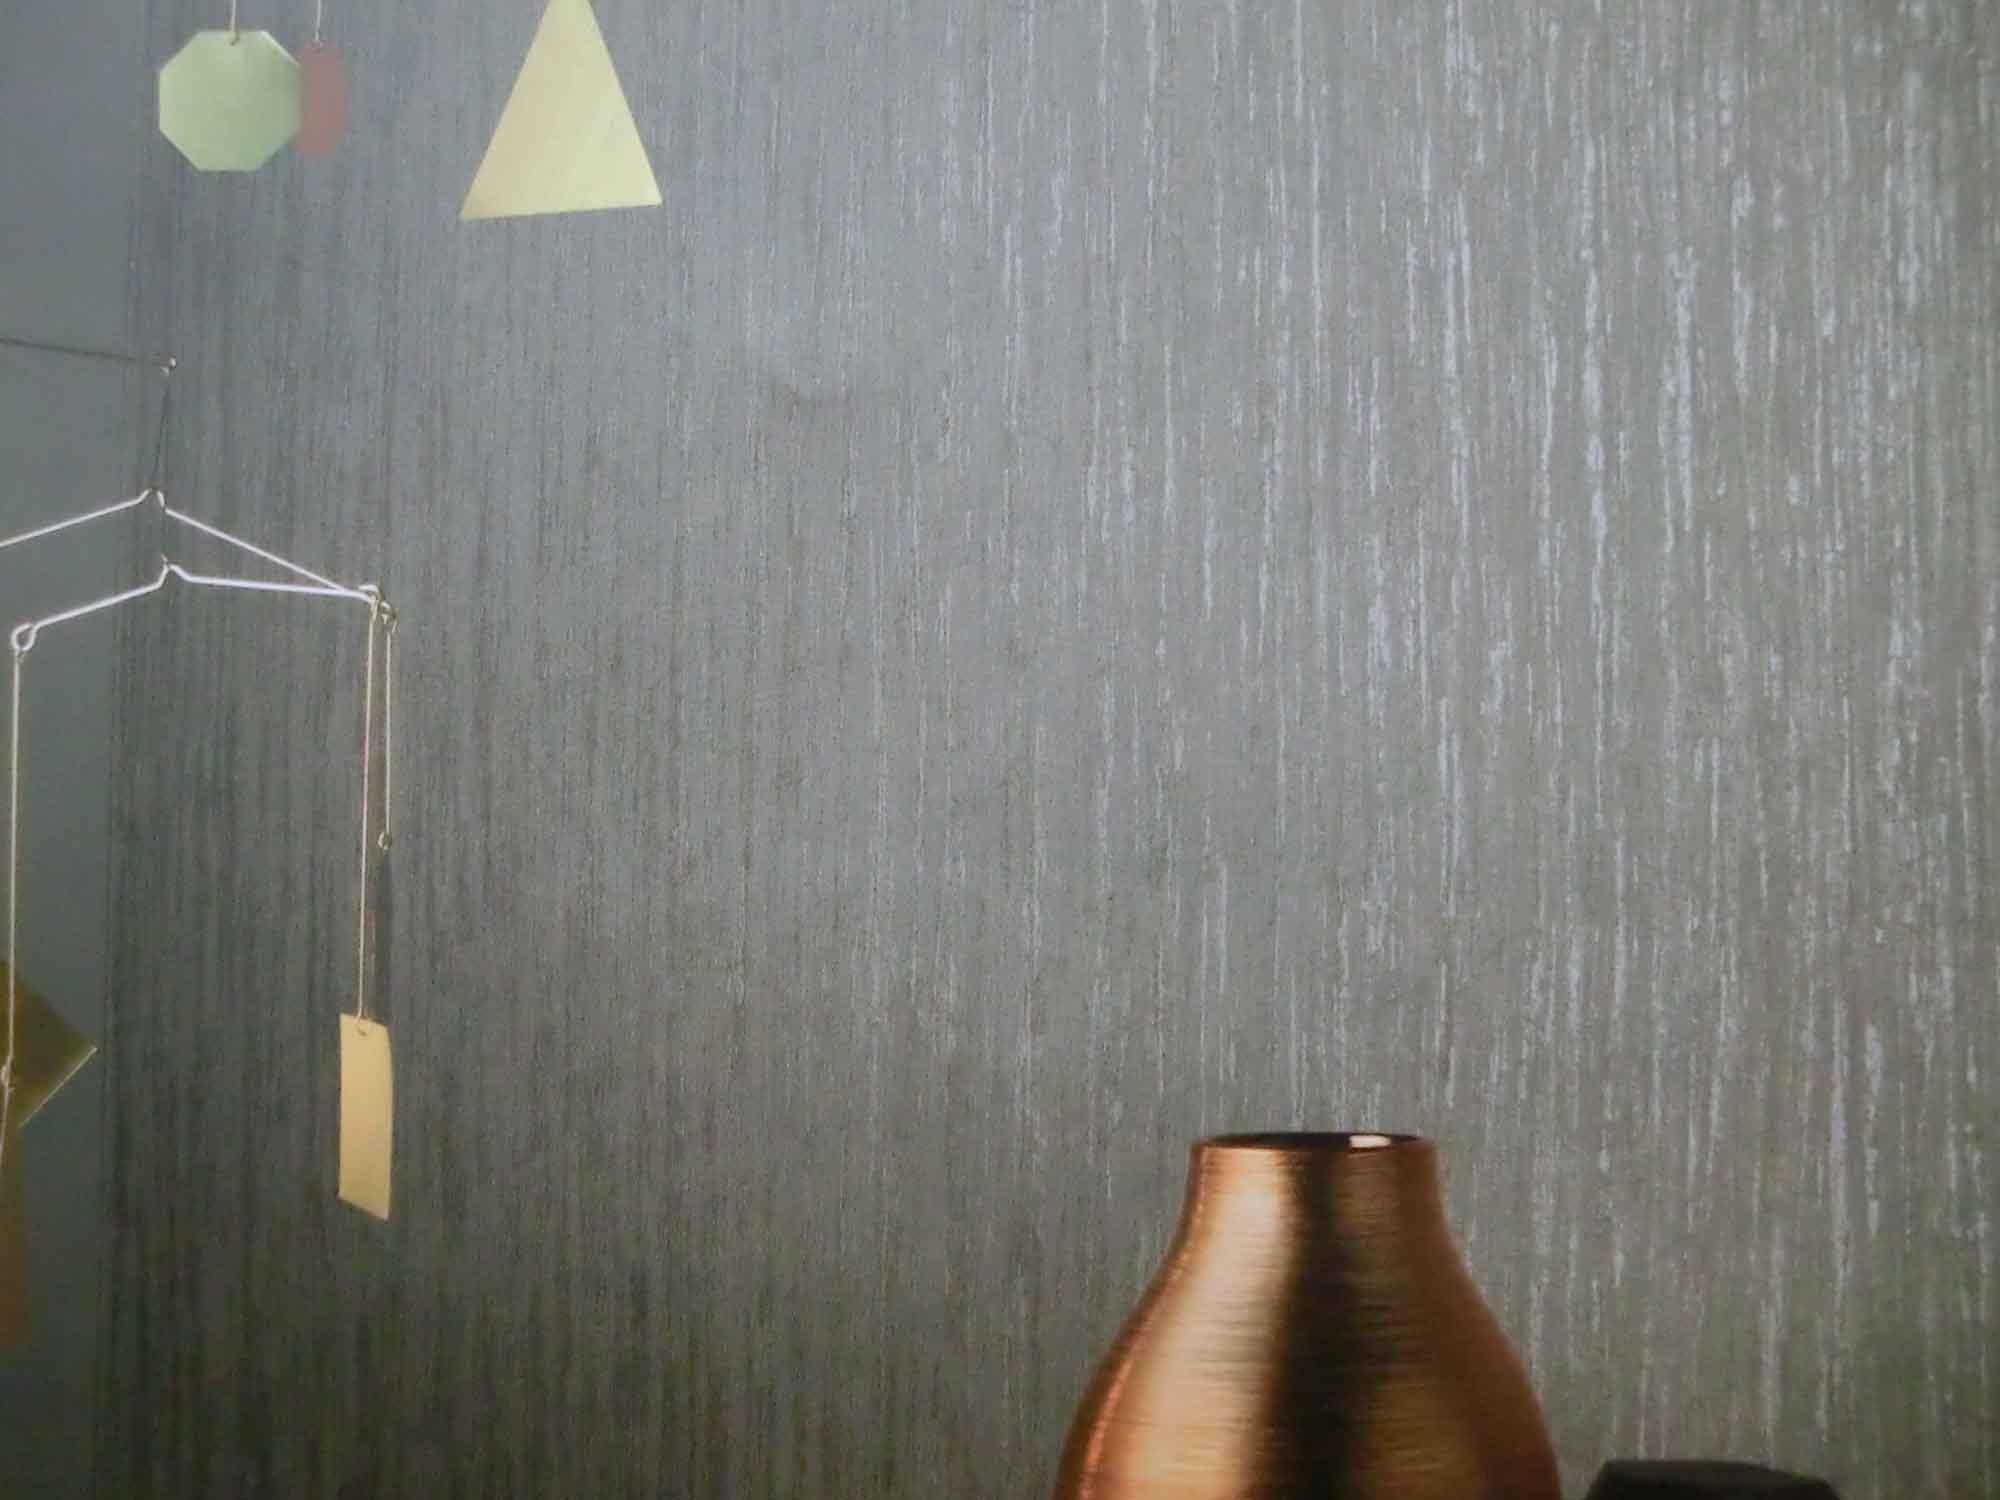 stil le corbusier tapeten design arte online kaufen. Black Bedroom Furniture Sets. Home Design Ideas